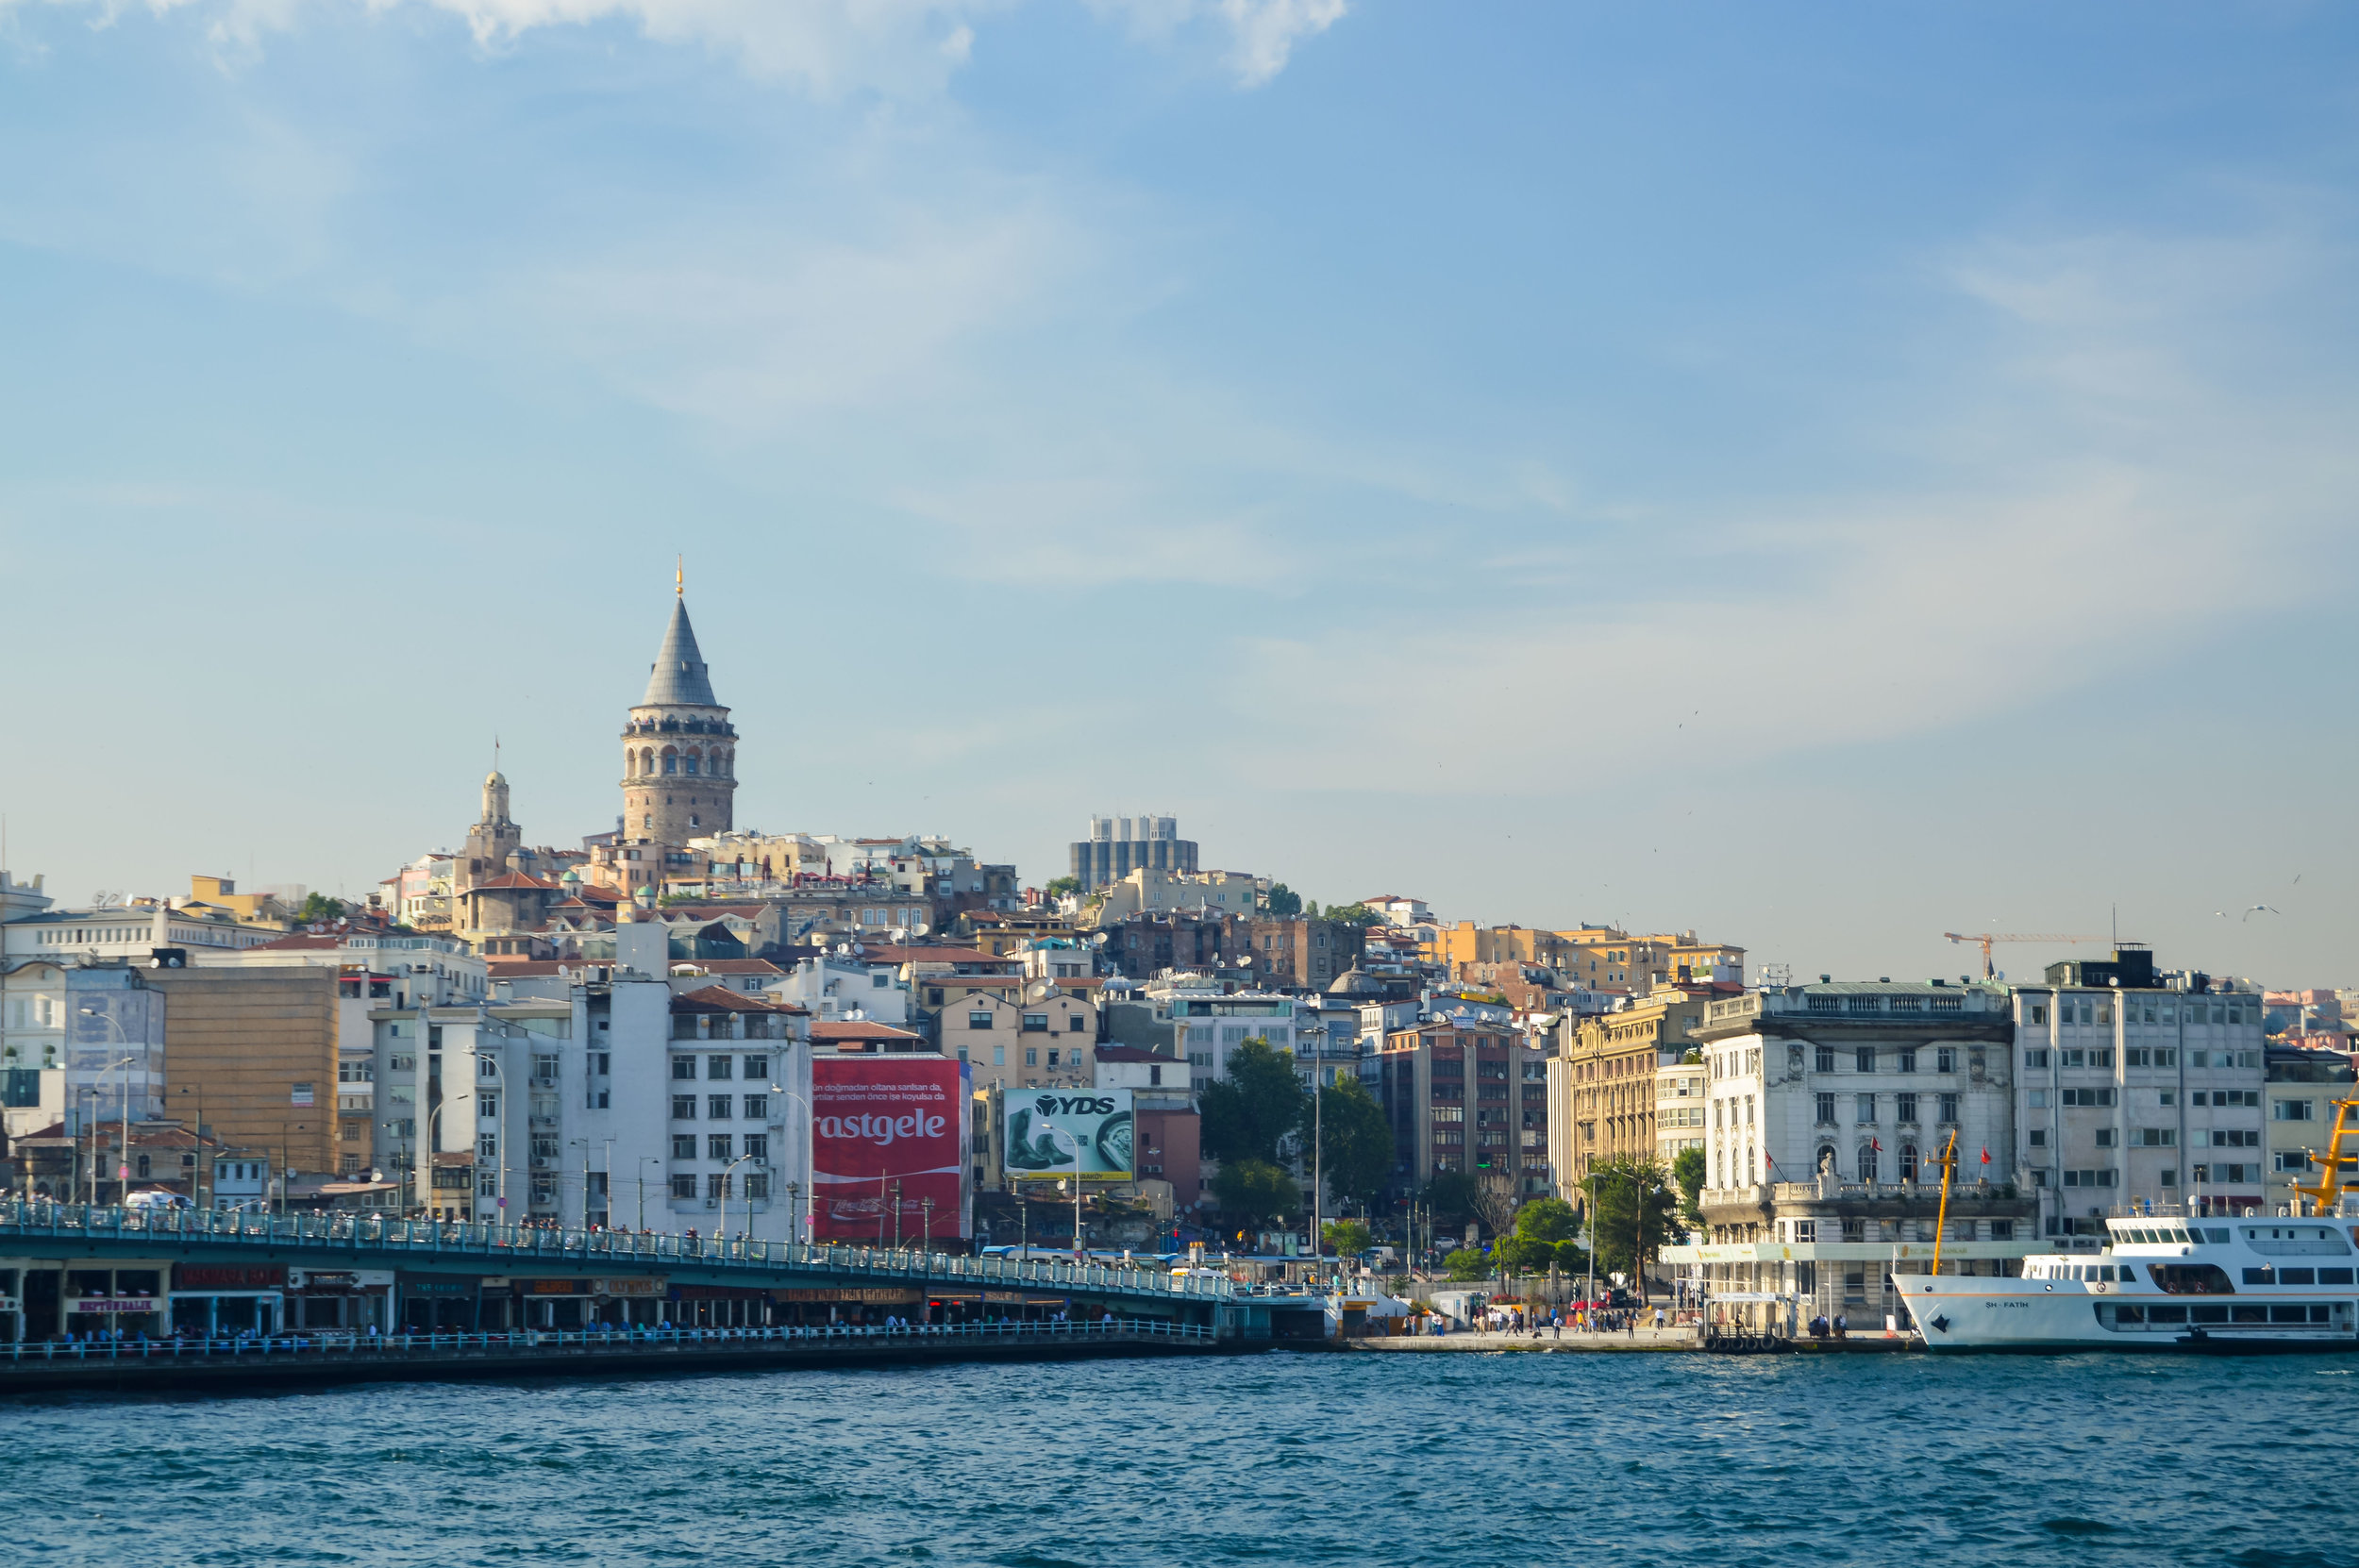 Galata Tower Rowhomes Skyline Bosporus Bosphorus Blue Sky Muslim Ottoman Empire Architecture Istanbul Turkey